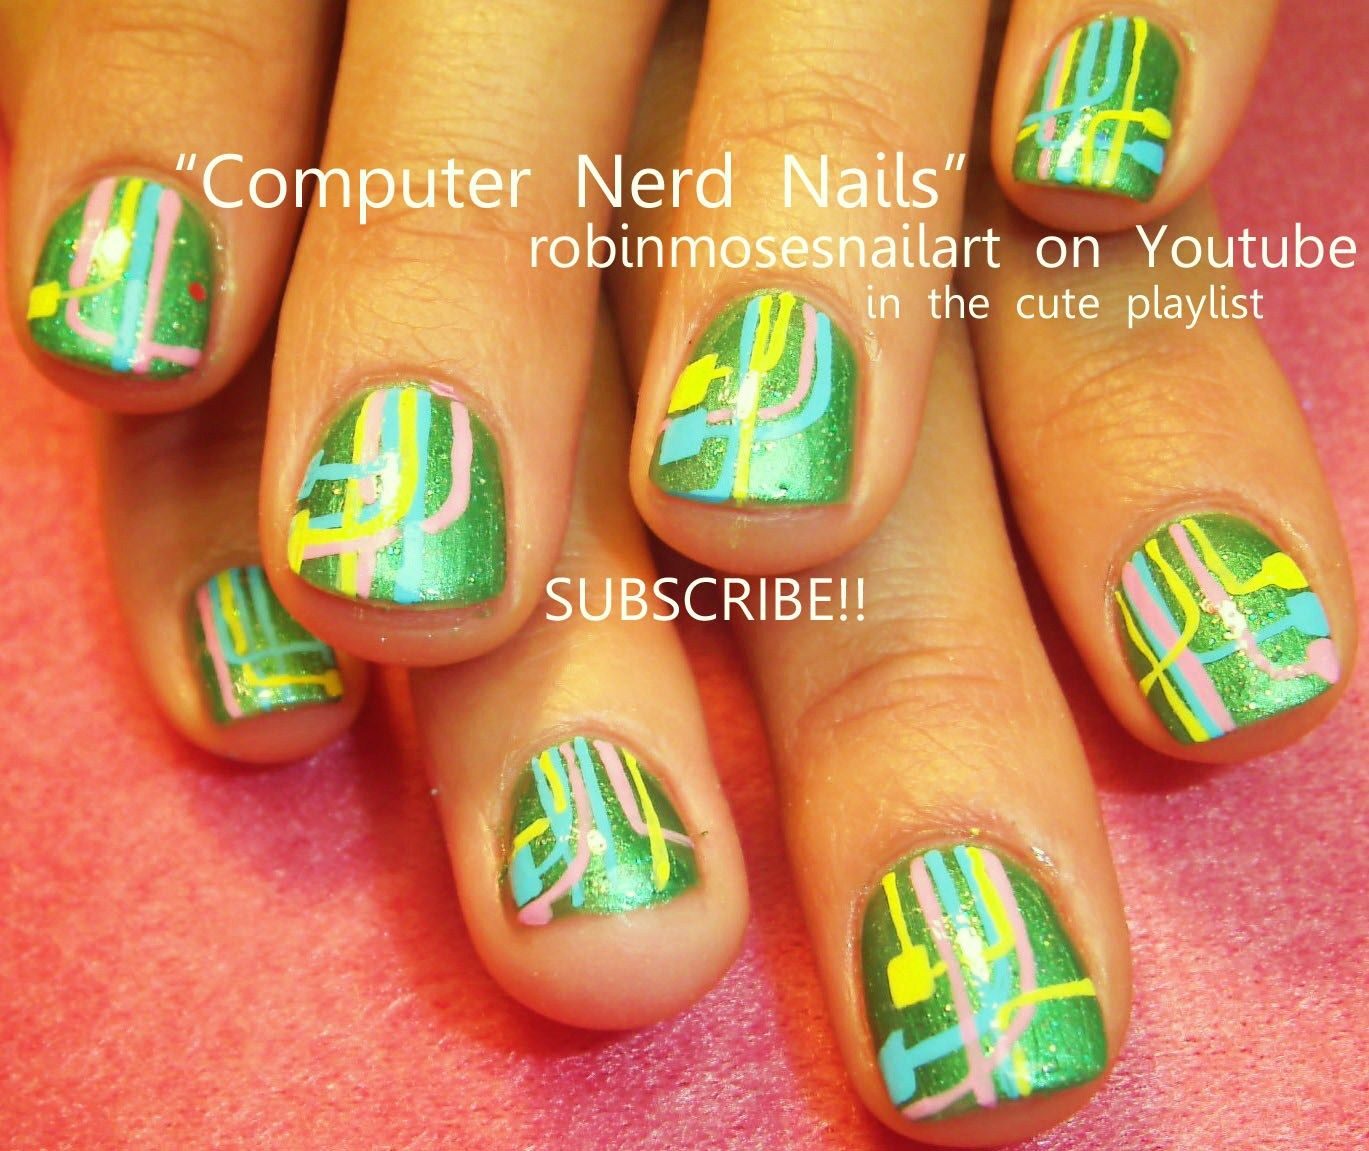 Nail Art By Robin Moses Nerd Nails Httpyoutubewatchv